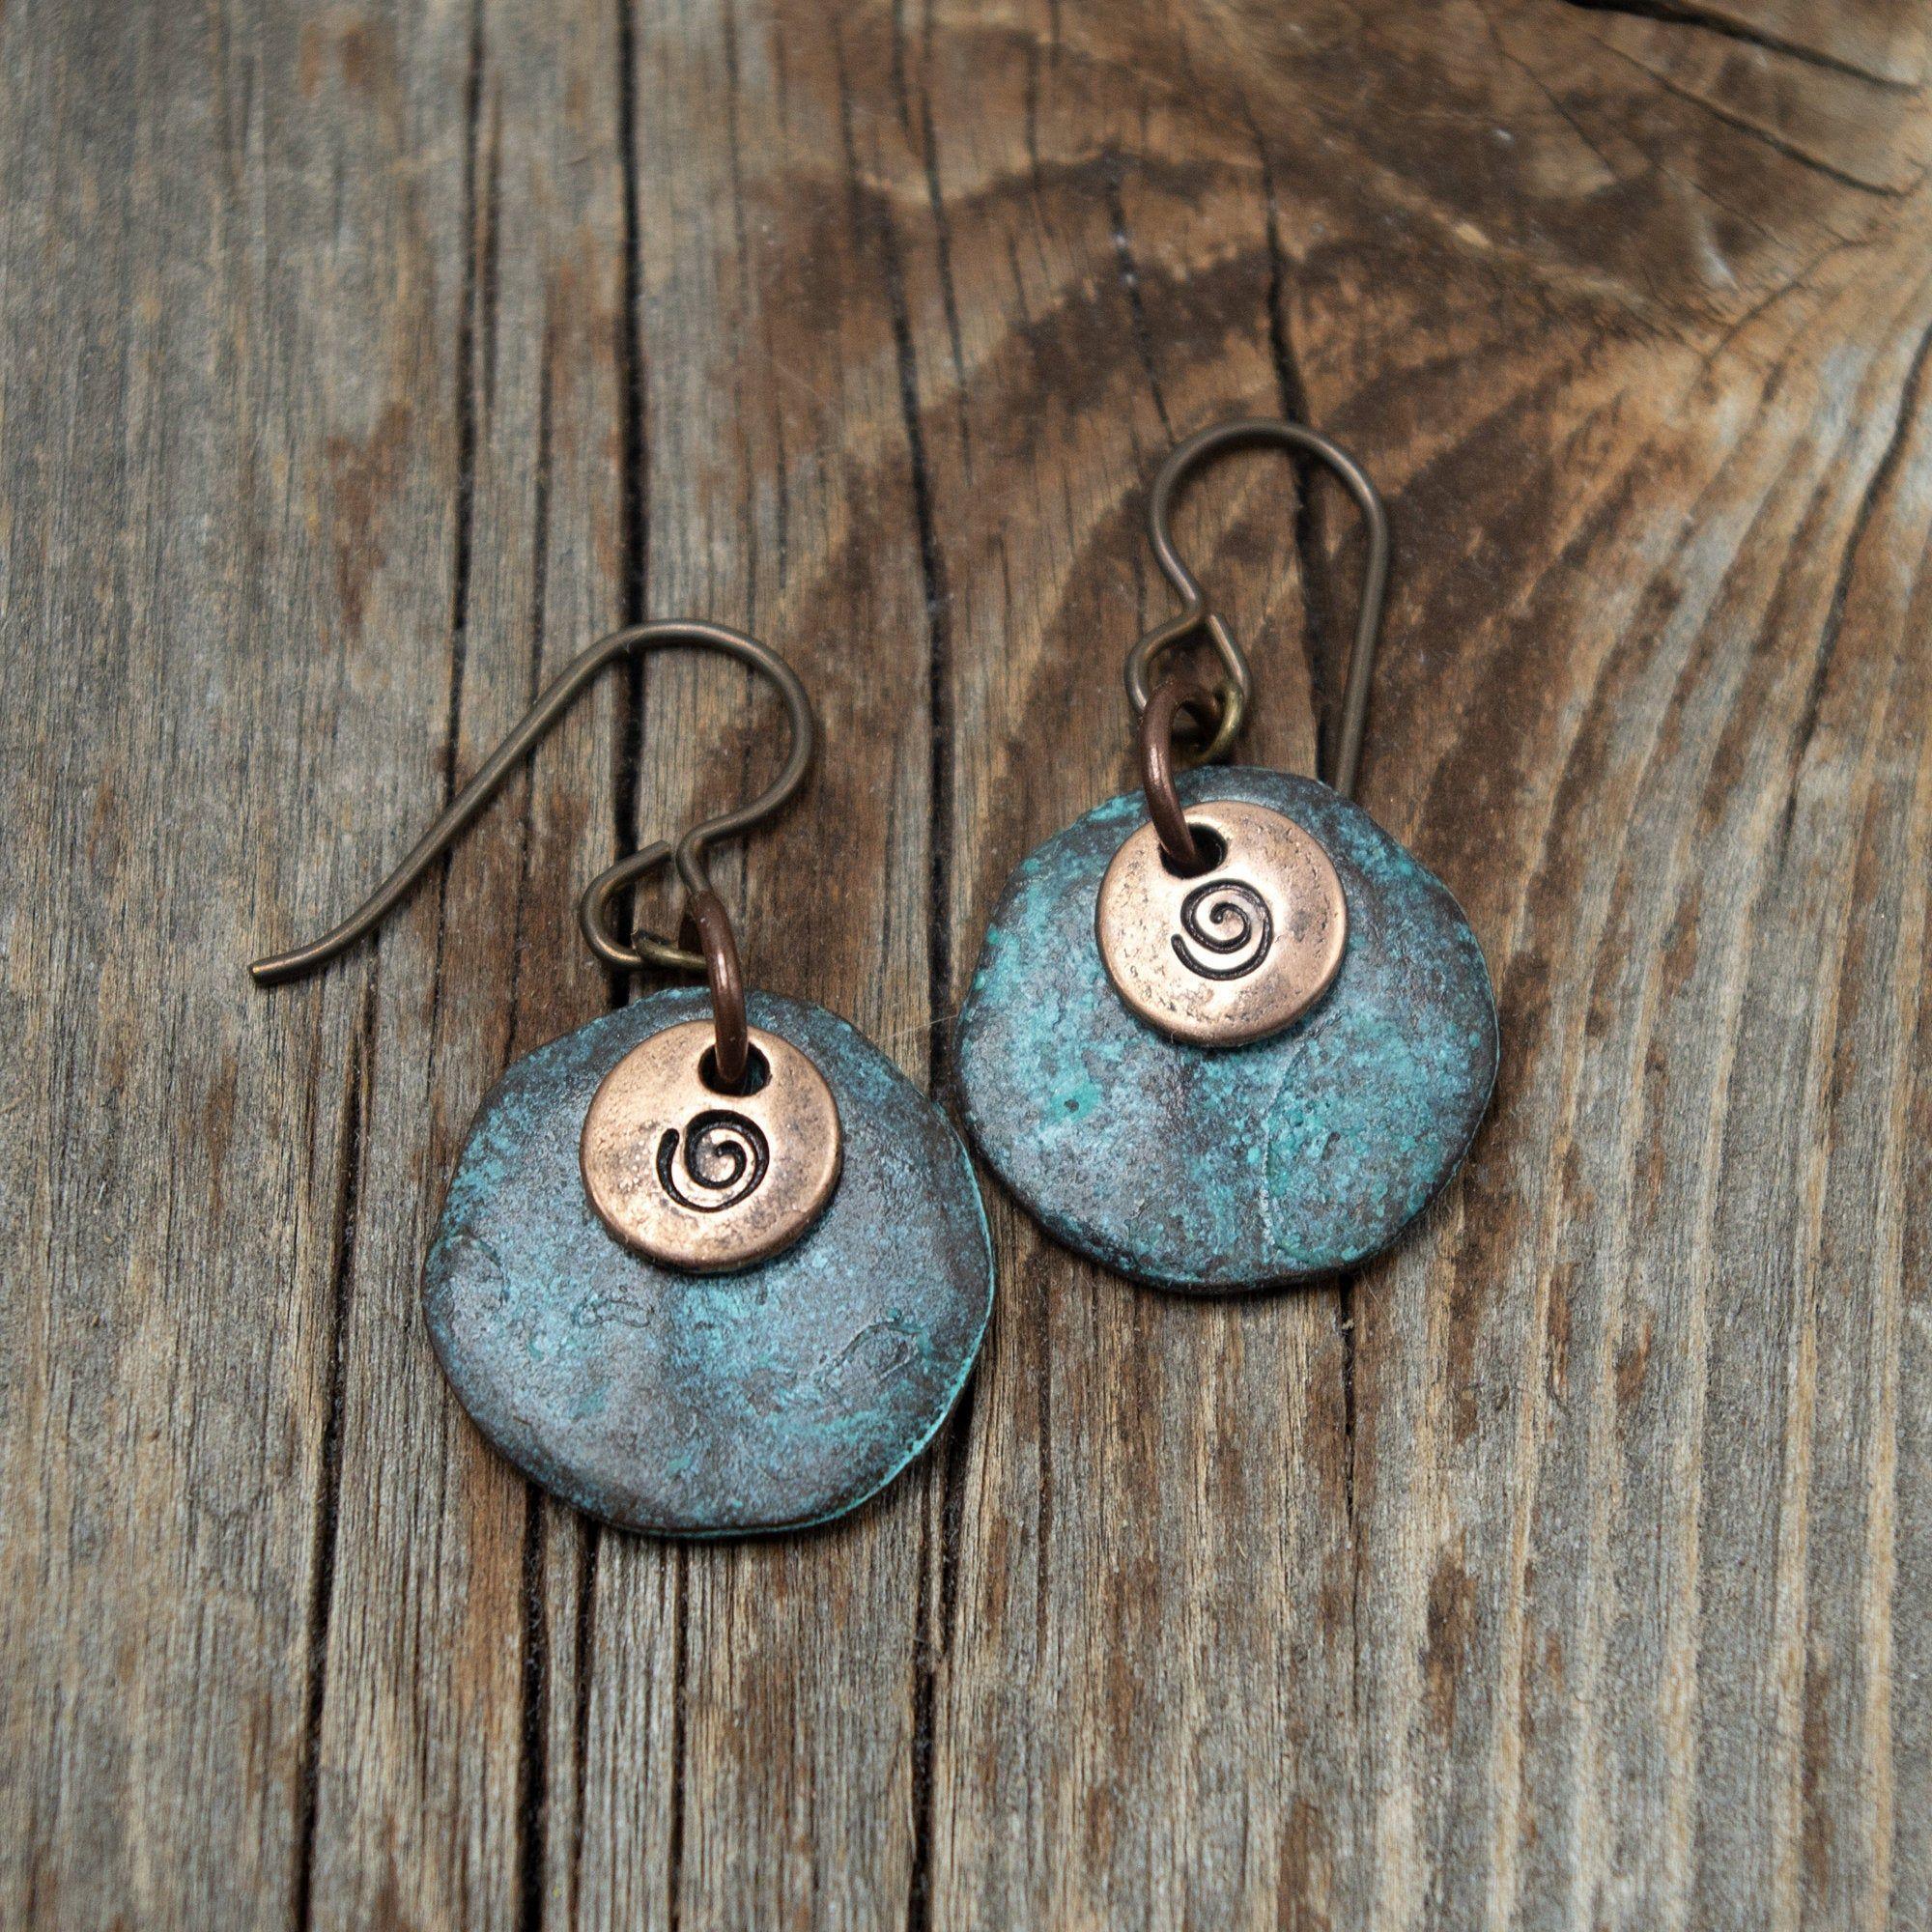 simple boho earrings antiqued copper teardrops Copper earrings with hypoallergenic niobium ear wires